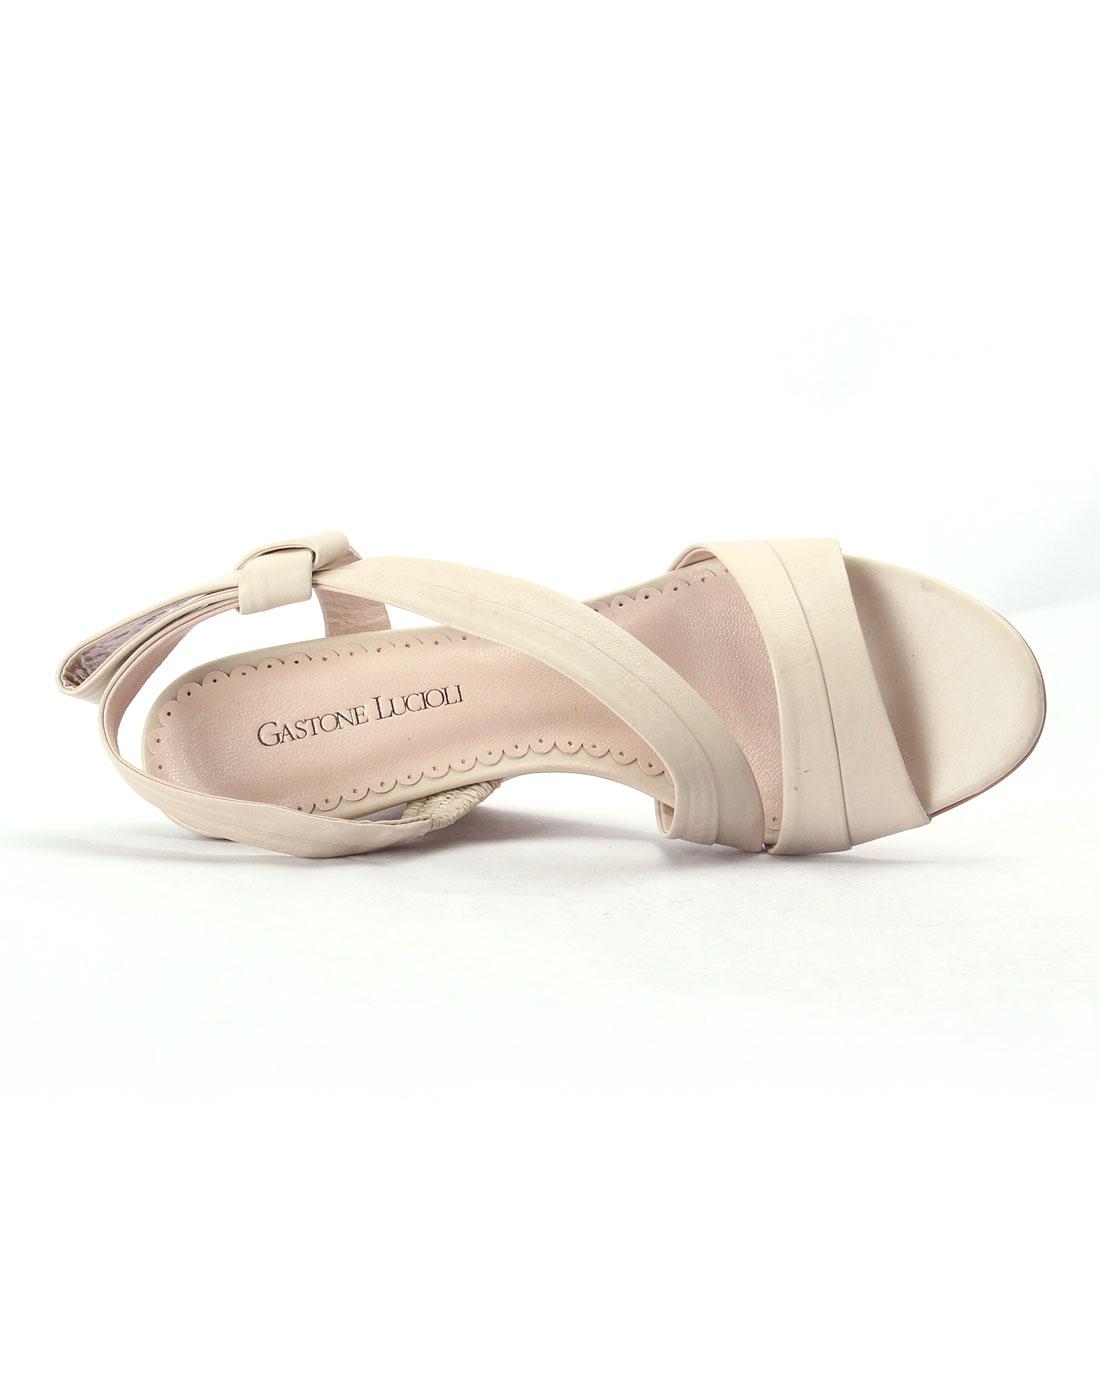 lucioli女款米白色小牛凉鞋gss11b